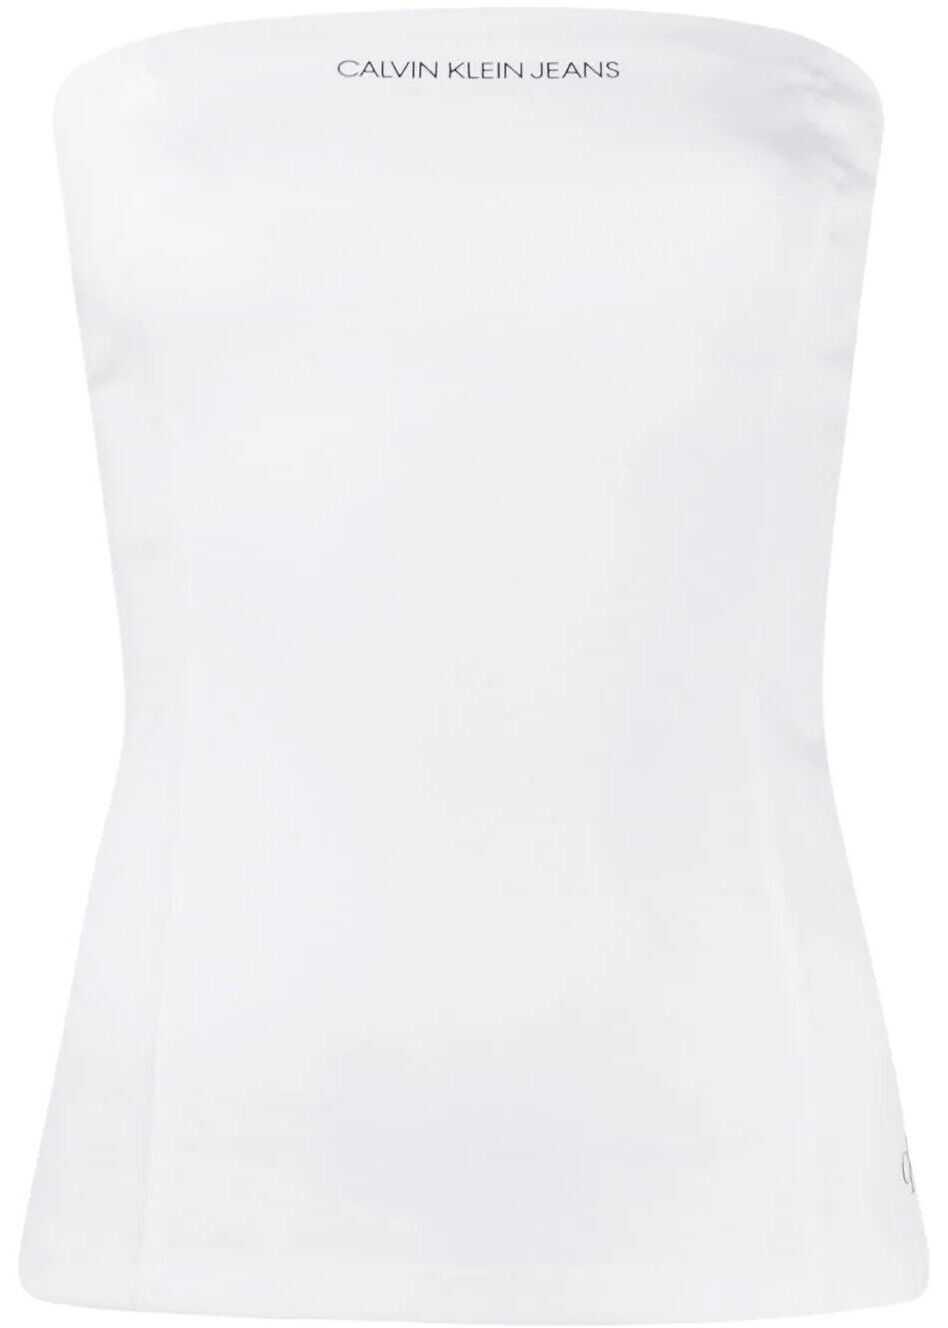 Calvin Klein Jeans Polyester Top WHITE